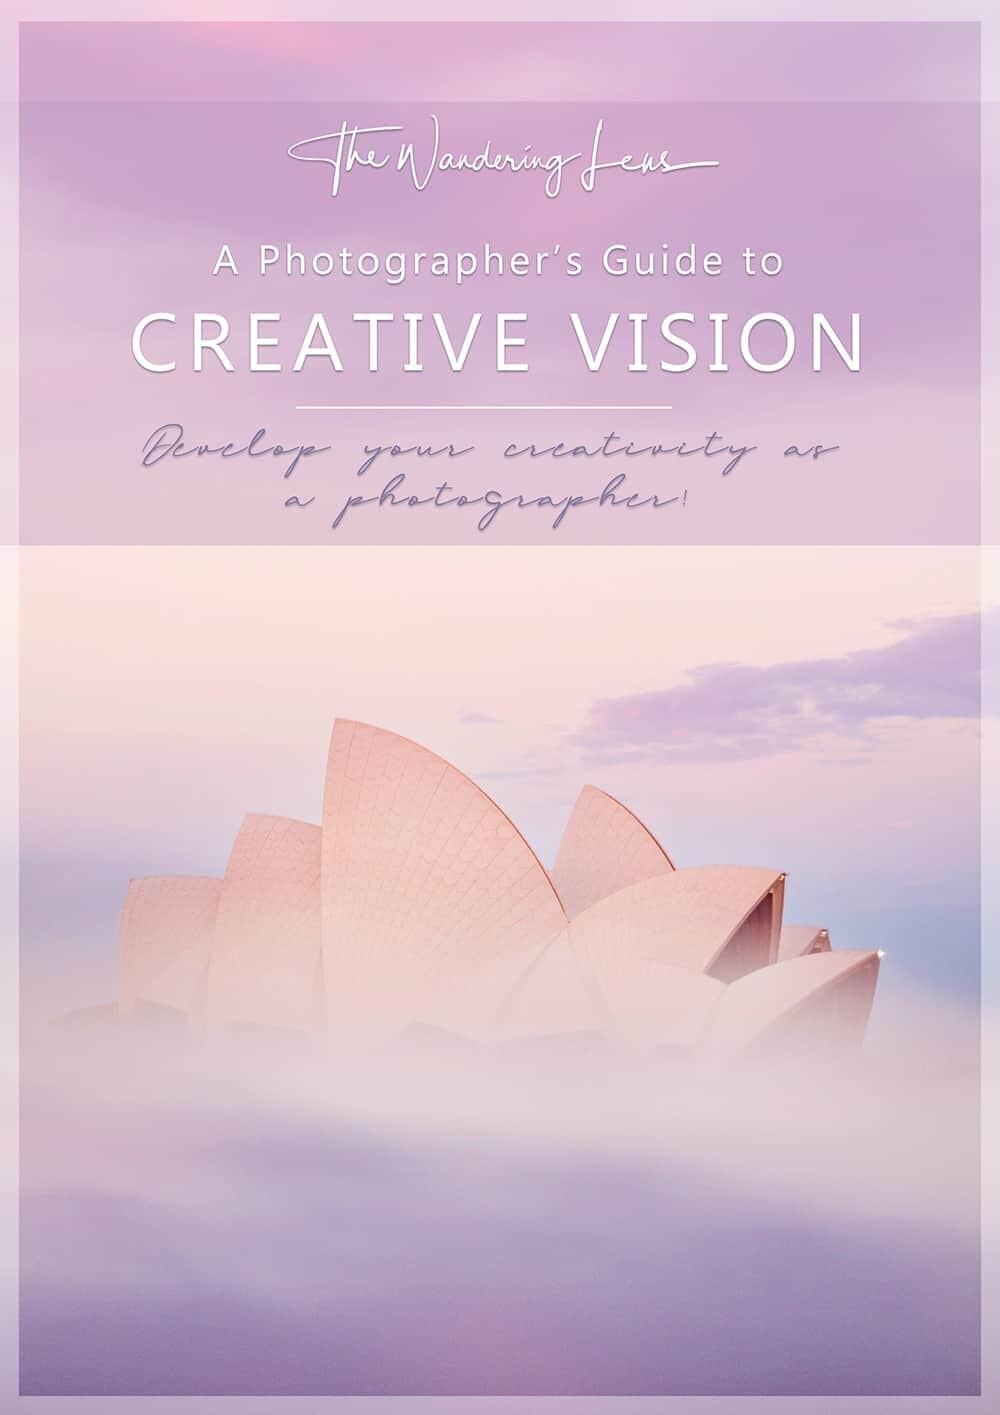 Creative Vision eBOOK - A Photographer's Guide to Unleashing their creativity.